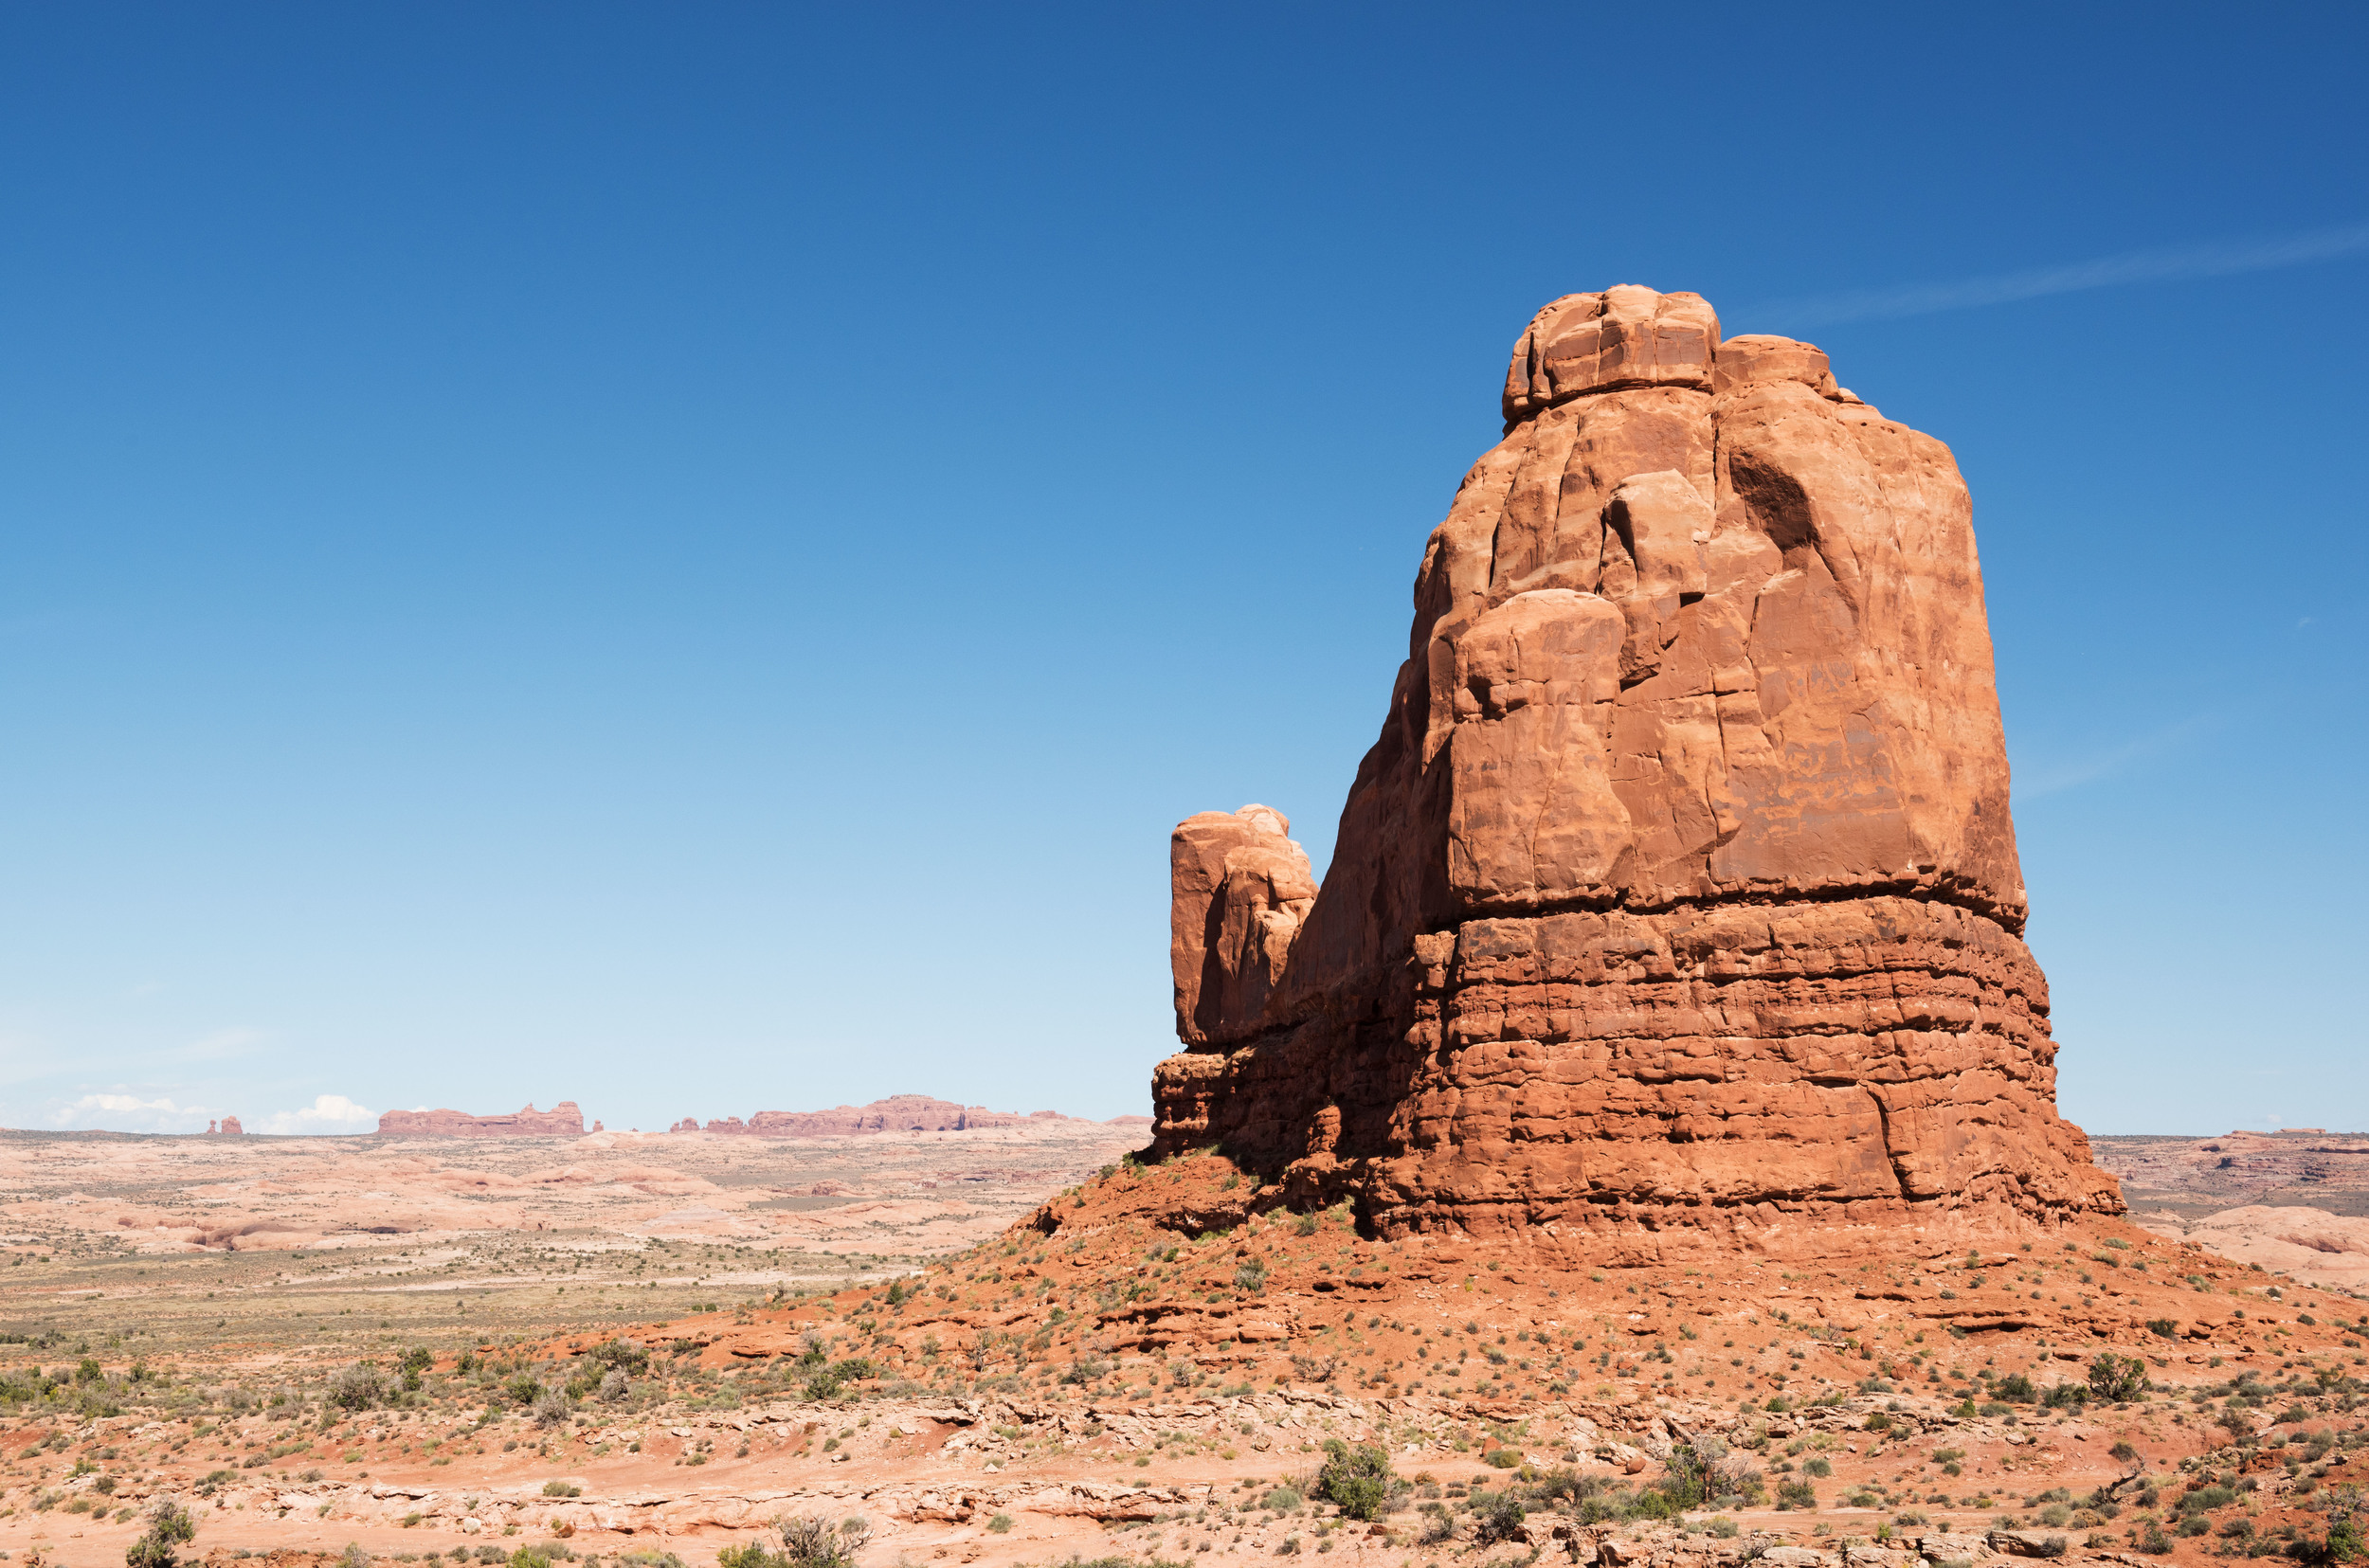 arches-national-park-utah-2